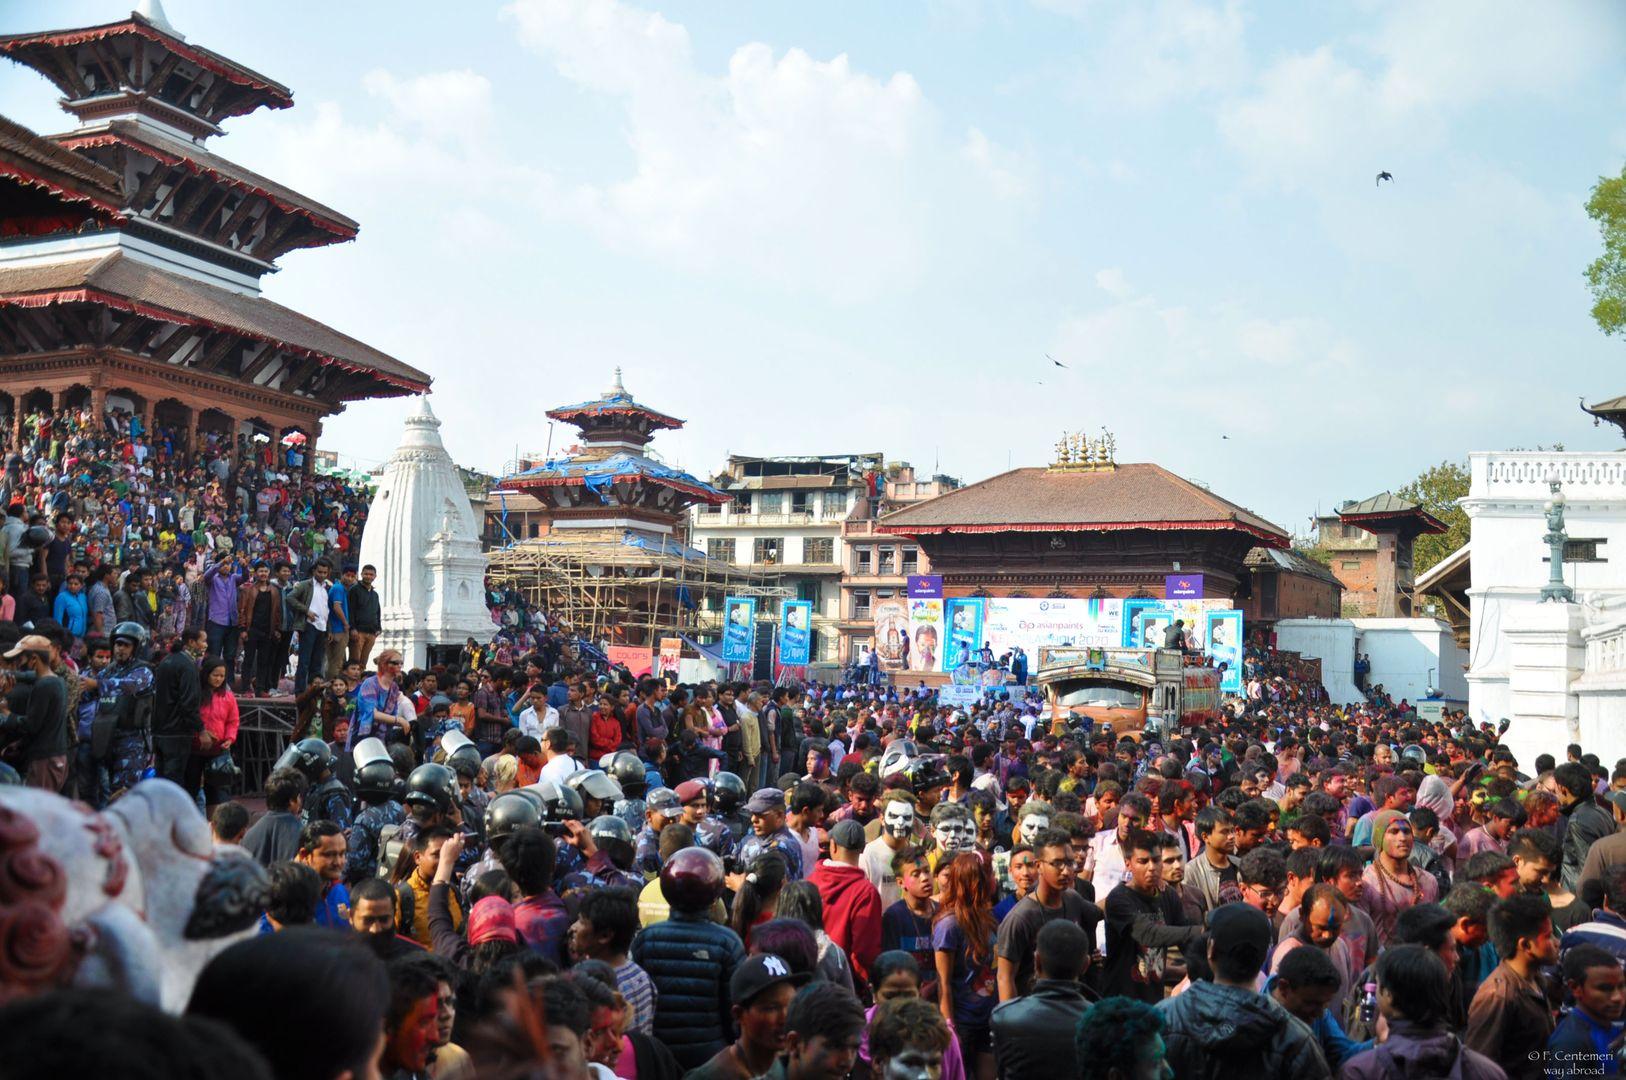 La piazza principale di Kathmandu